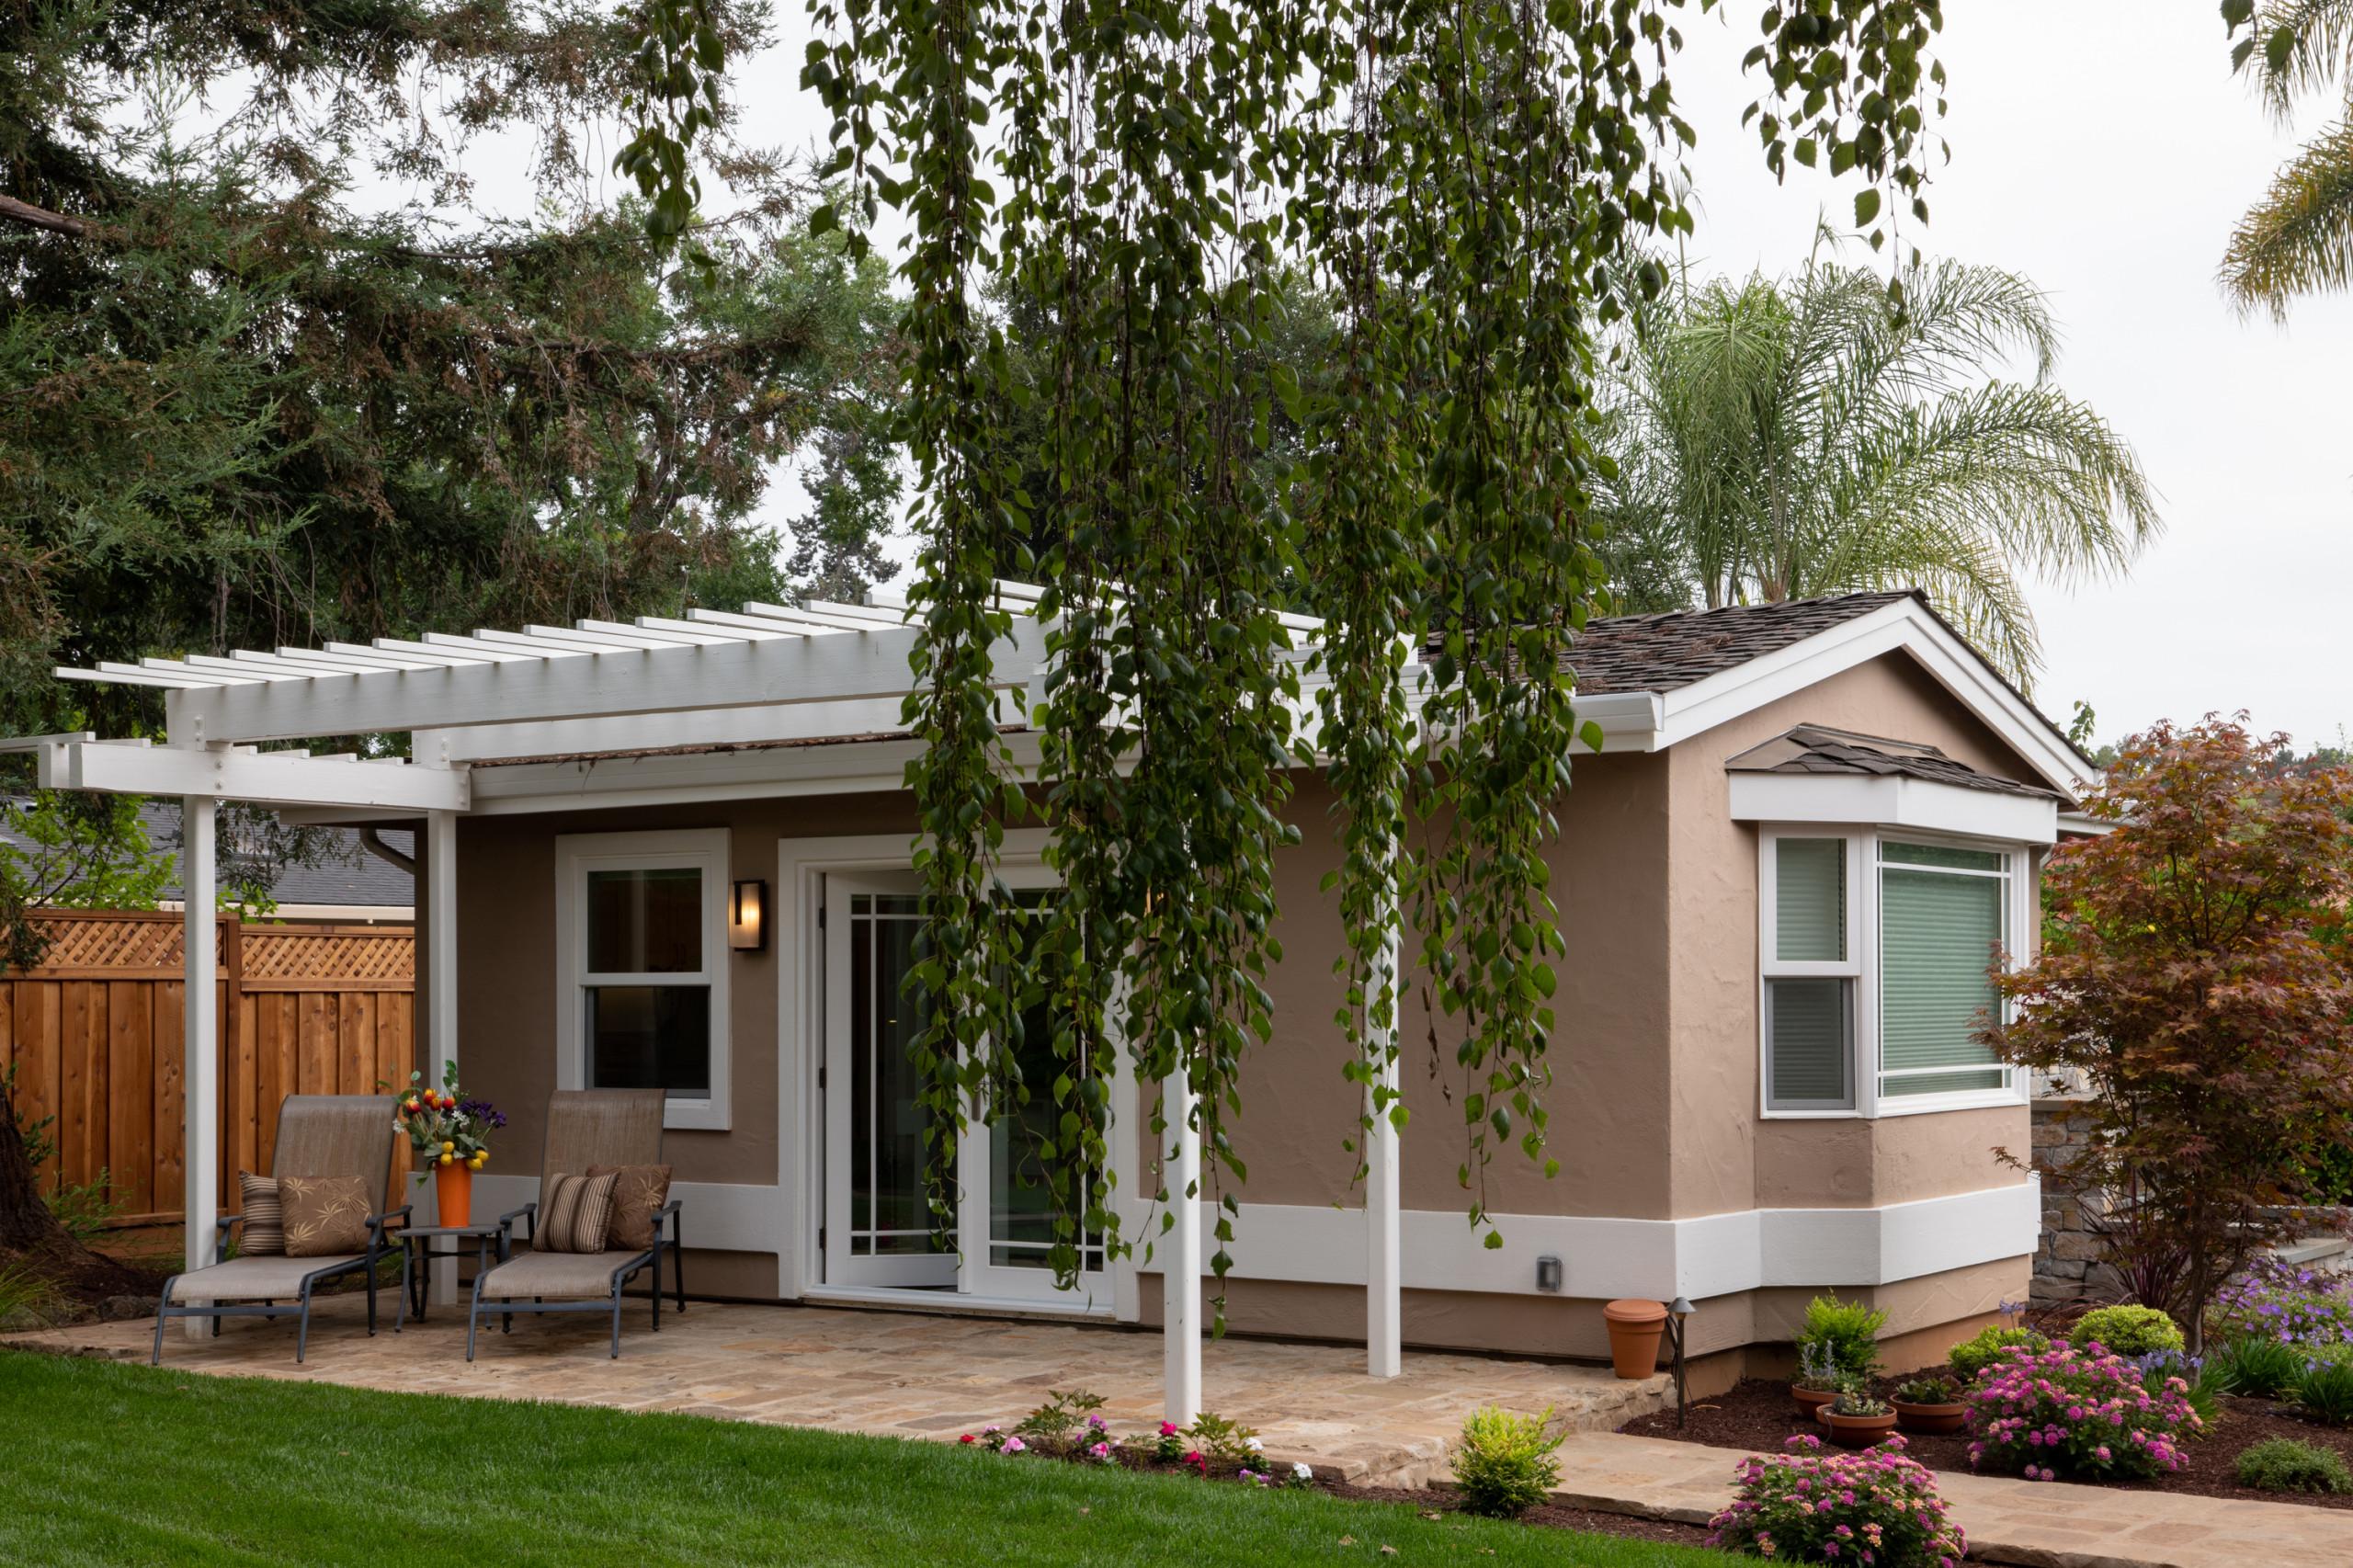 Los Altos Guest Cottage